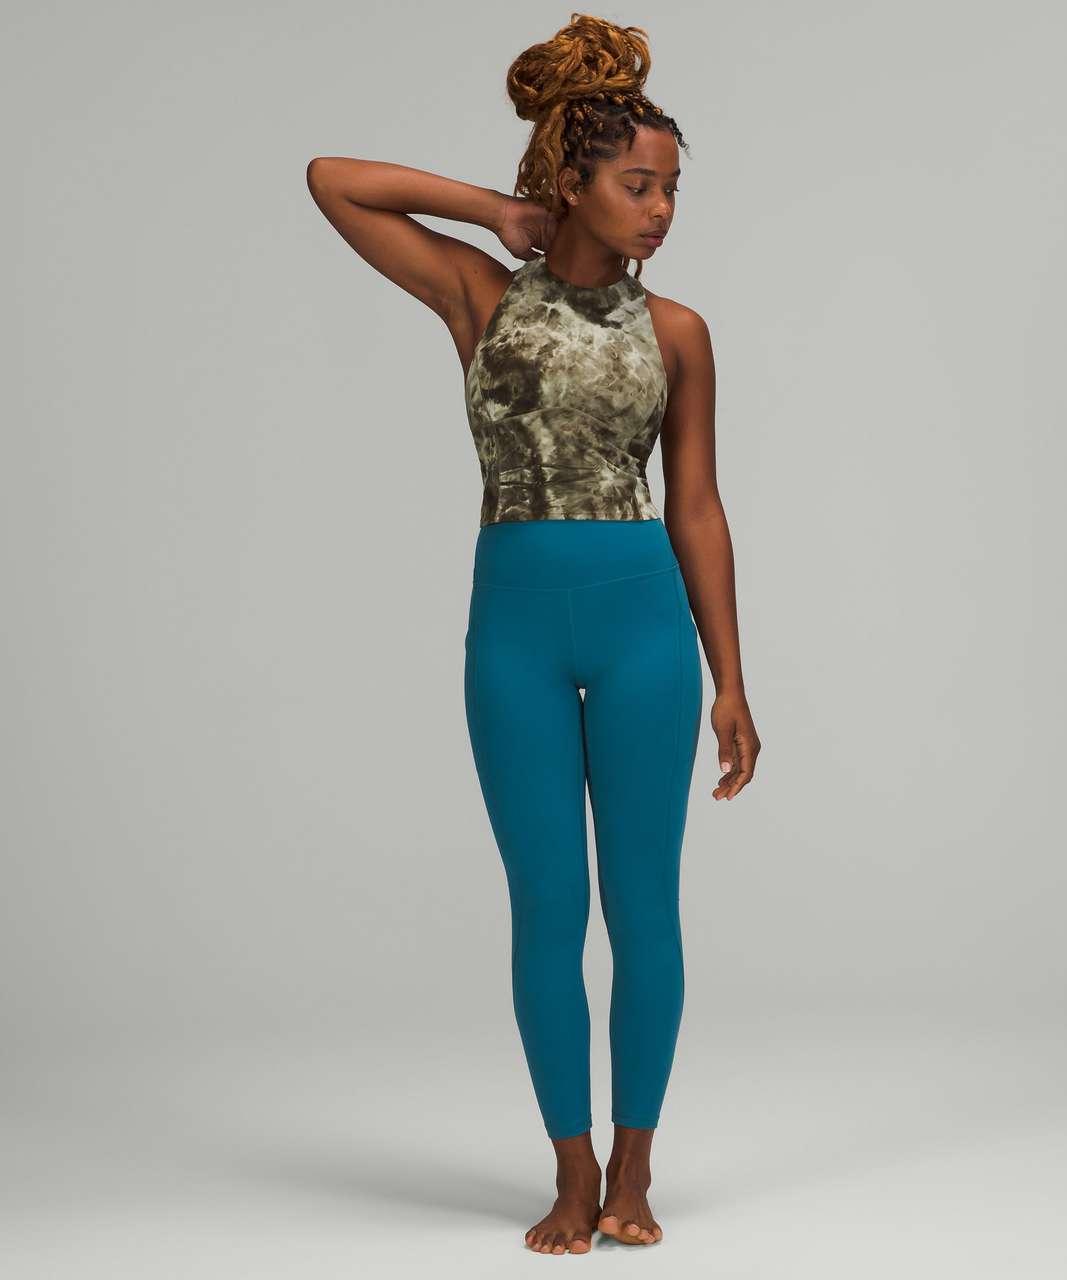 Lululemon Key to Balance Yoga Tank Top - Diamond Dye Light Sage Medium Olive